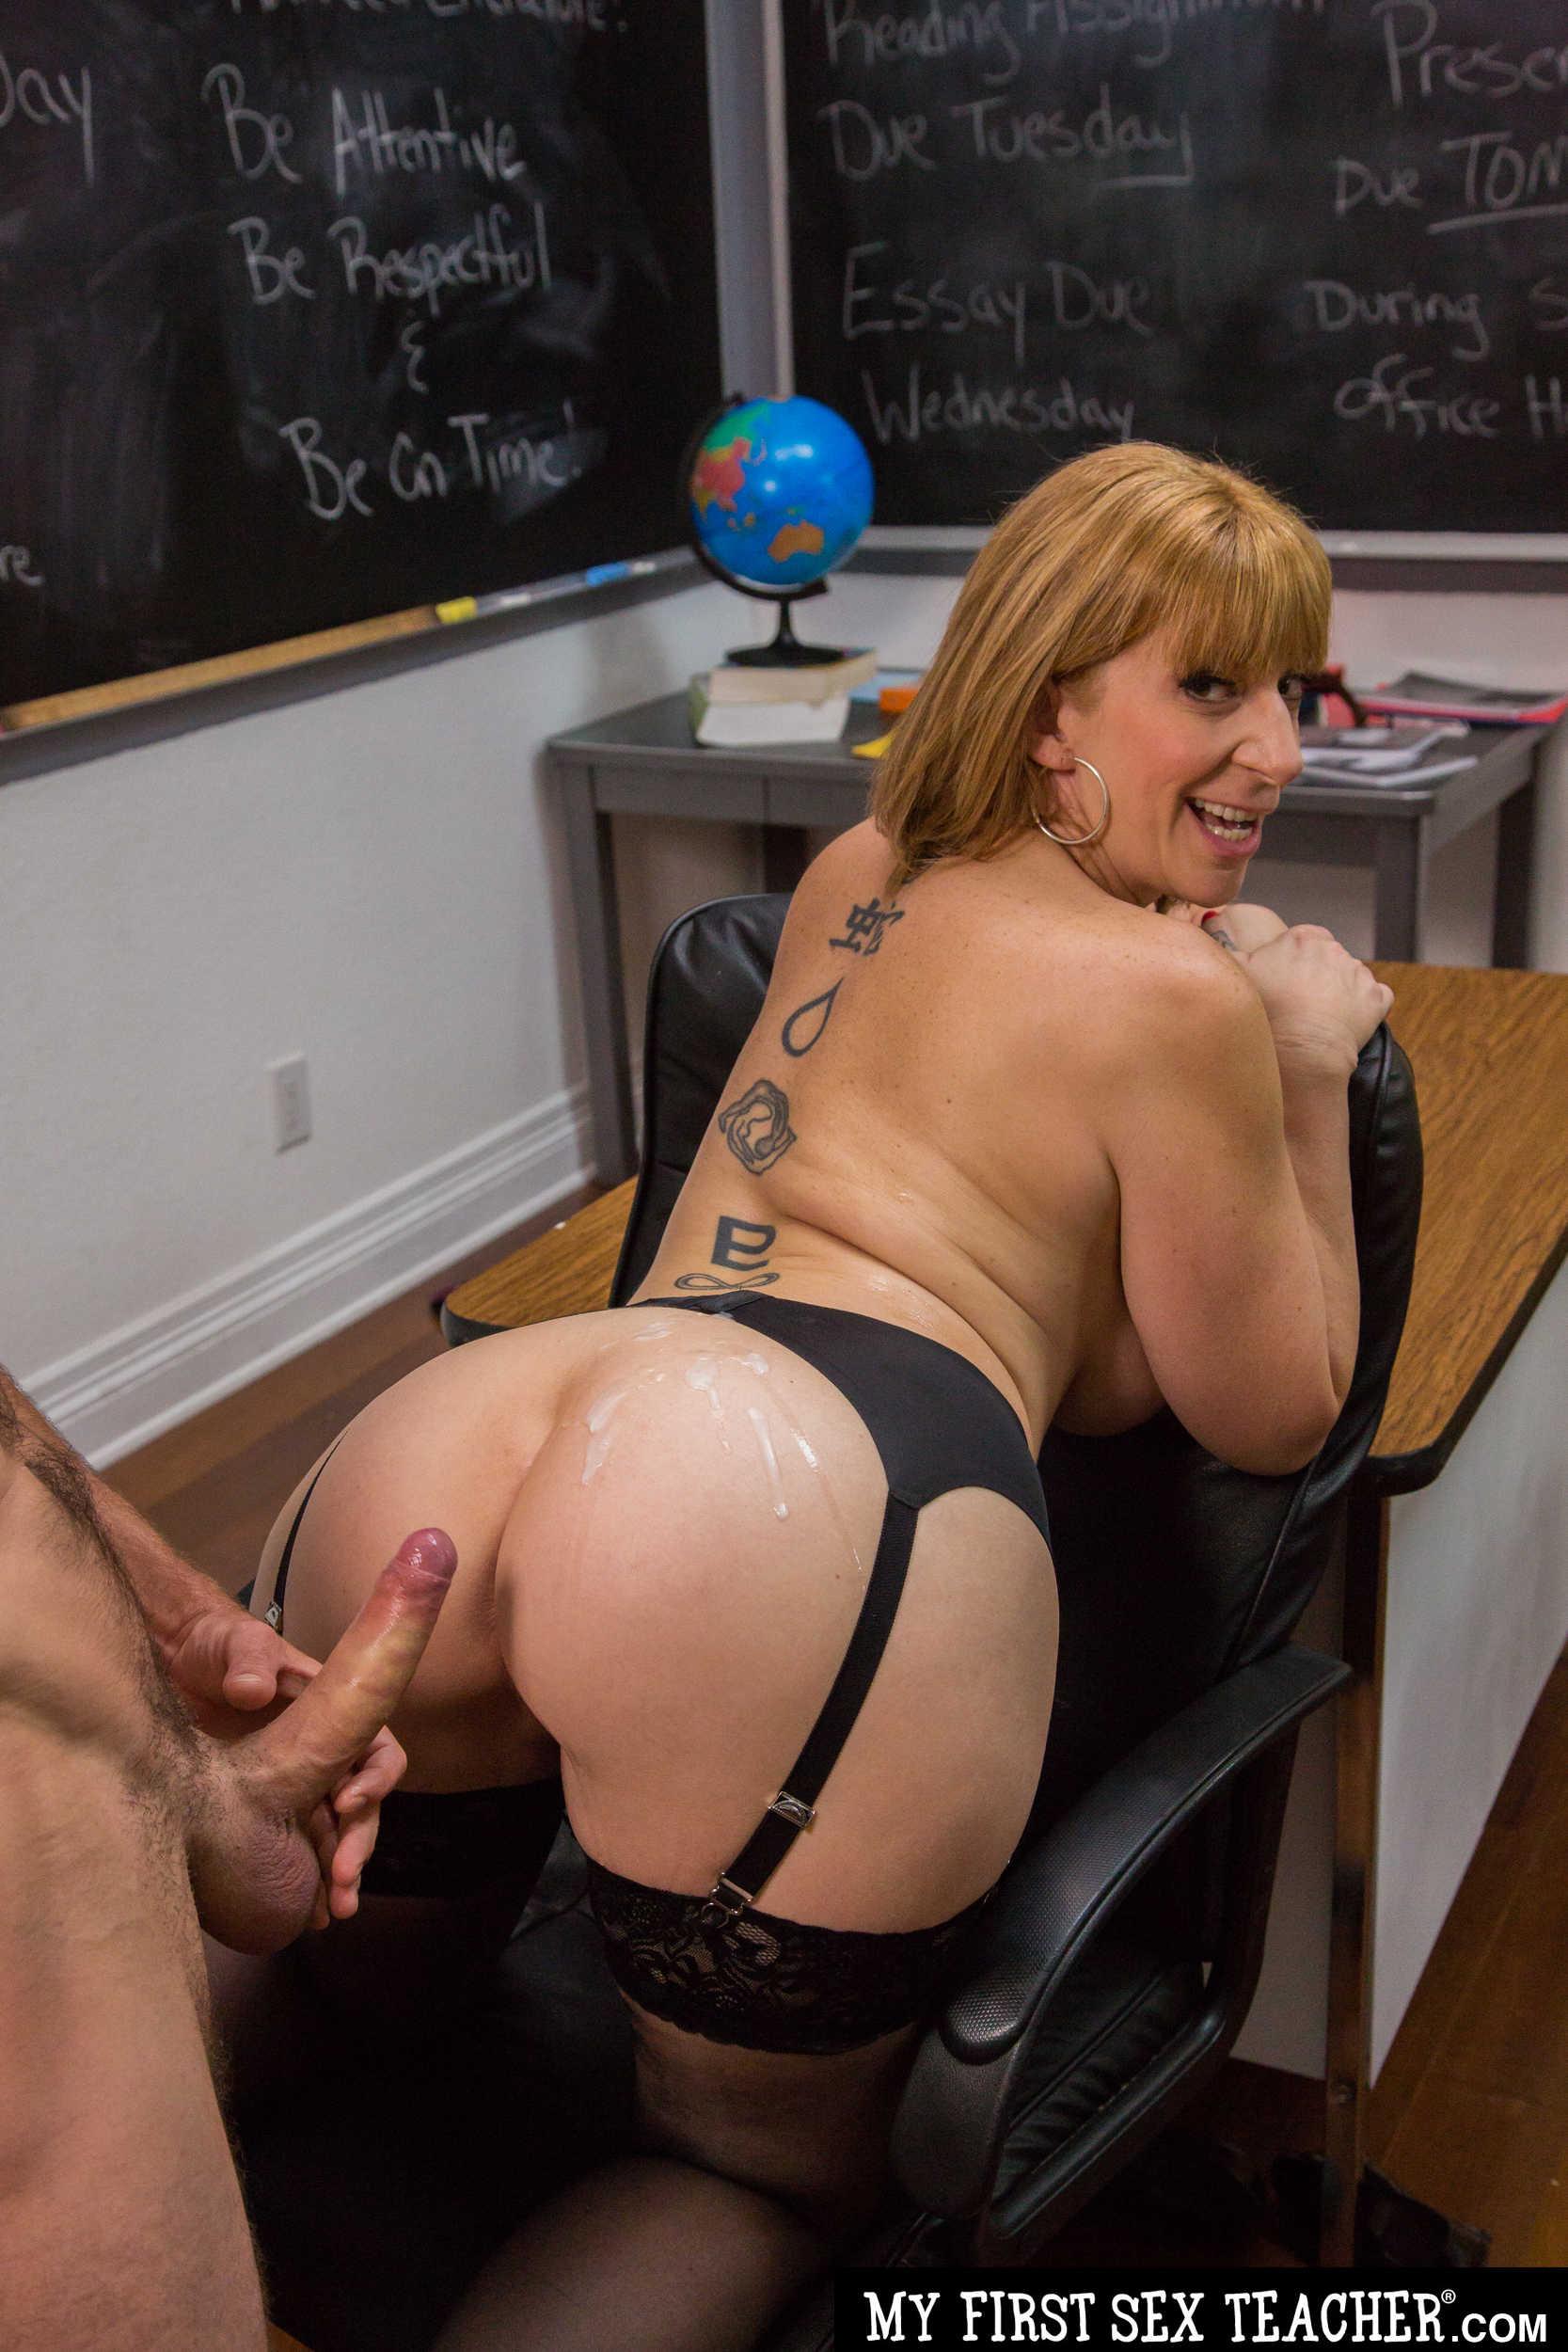 Pics of my first sex teacher — img 5